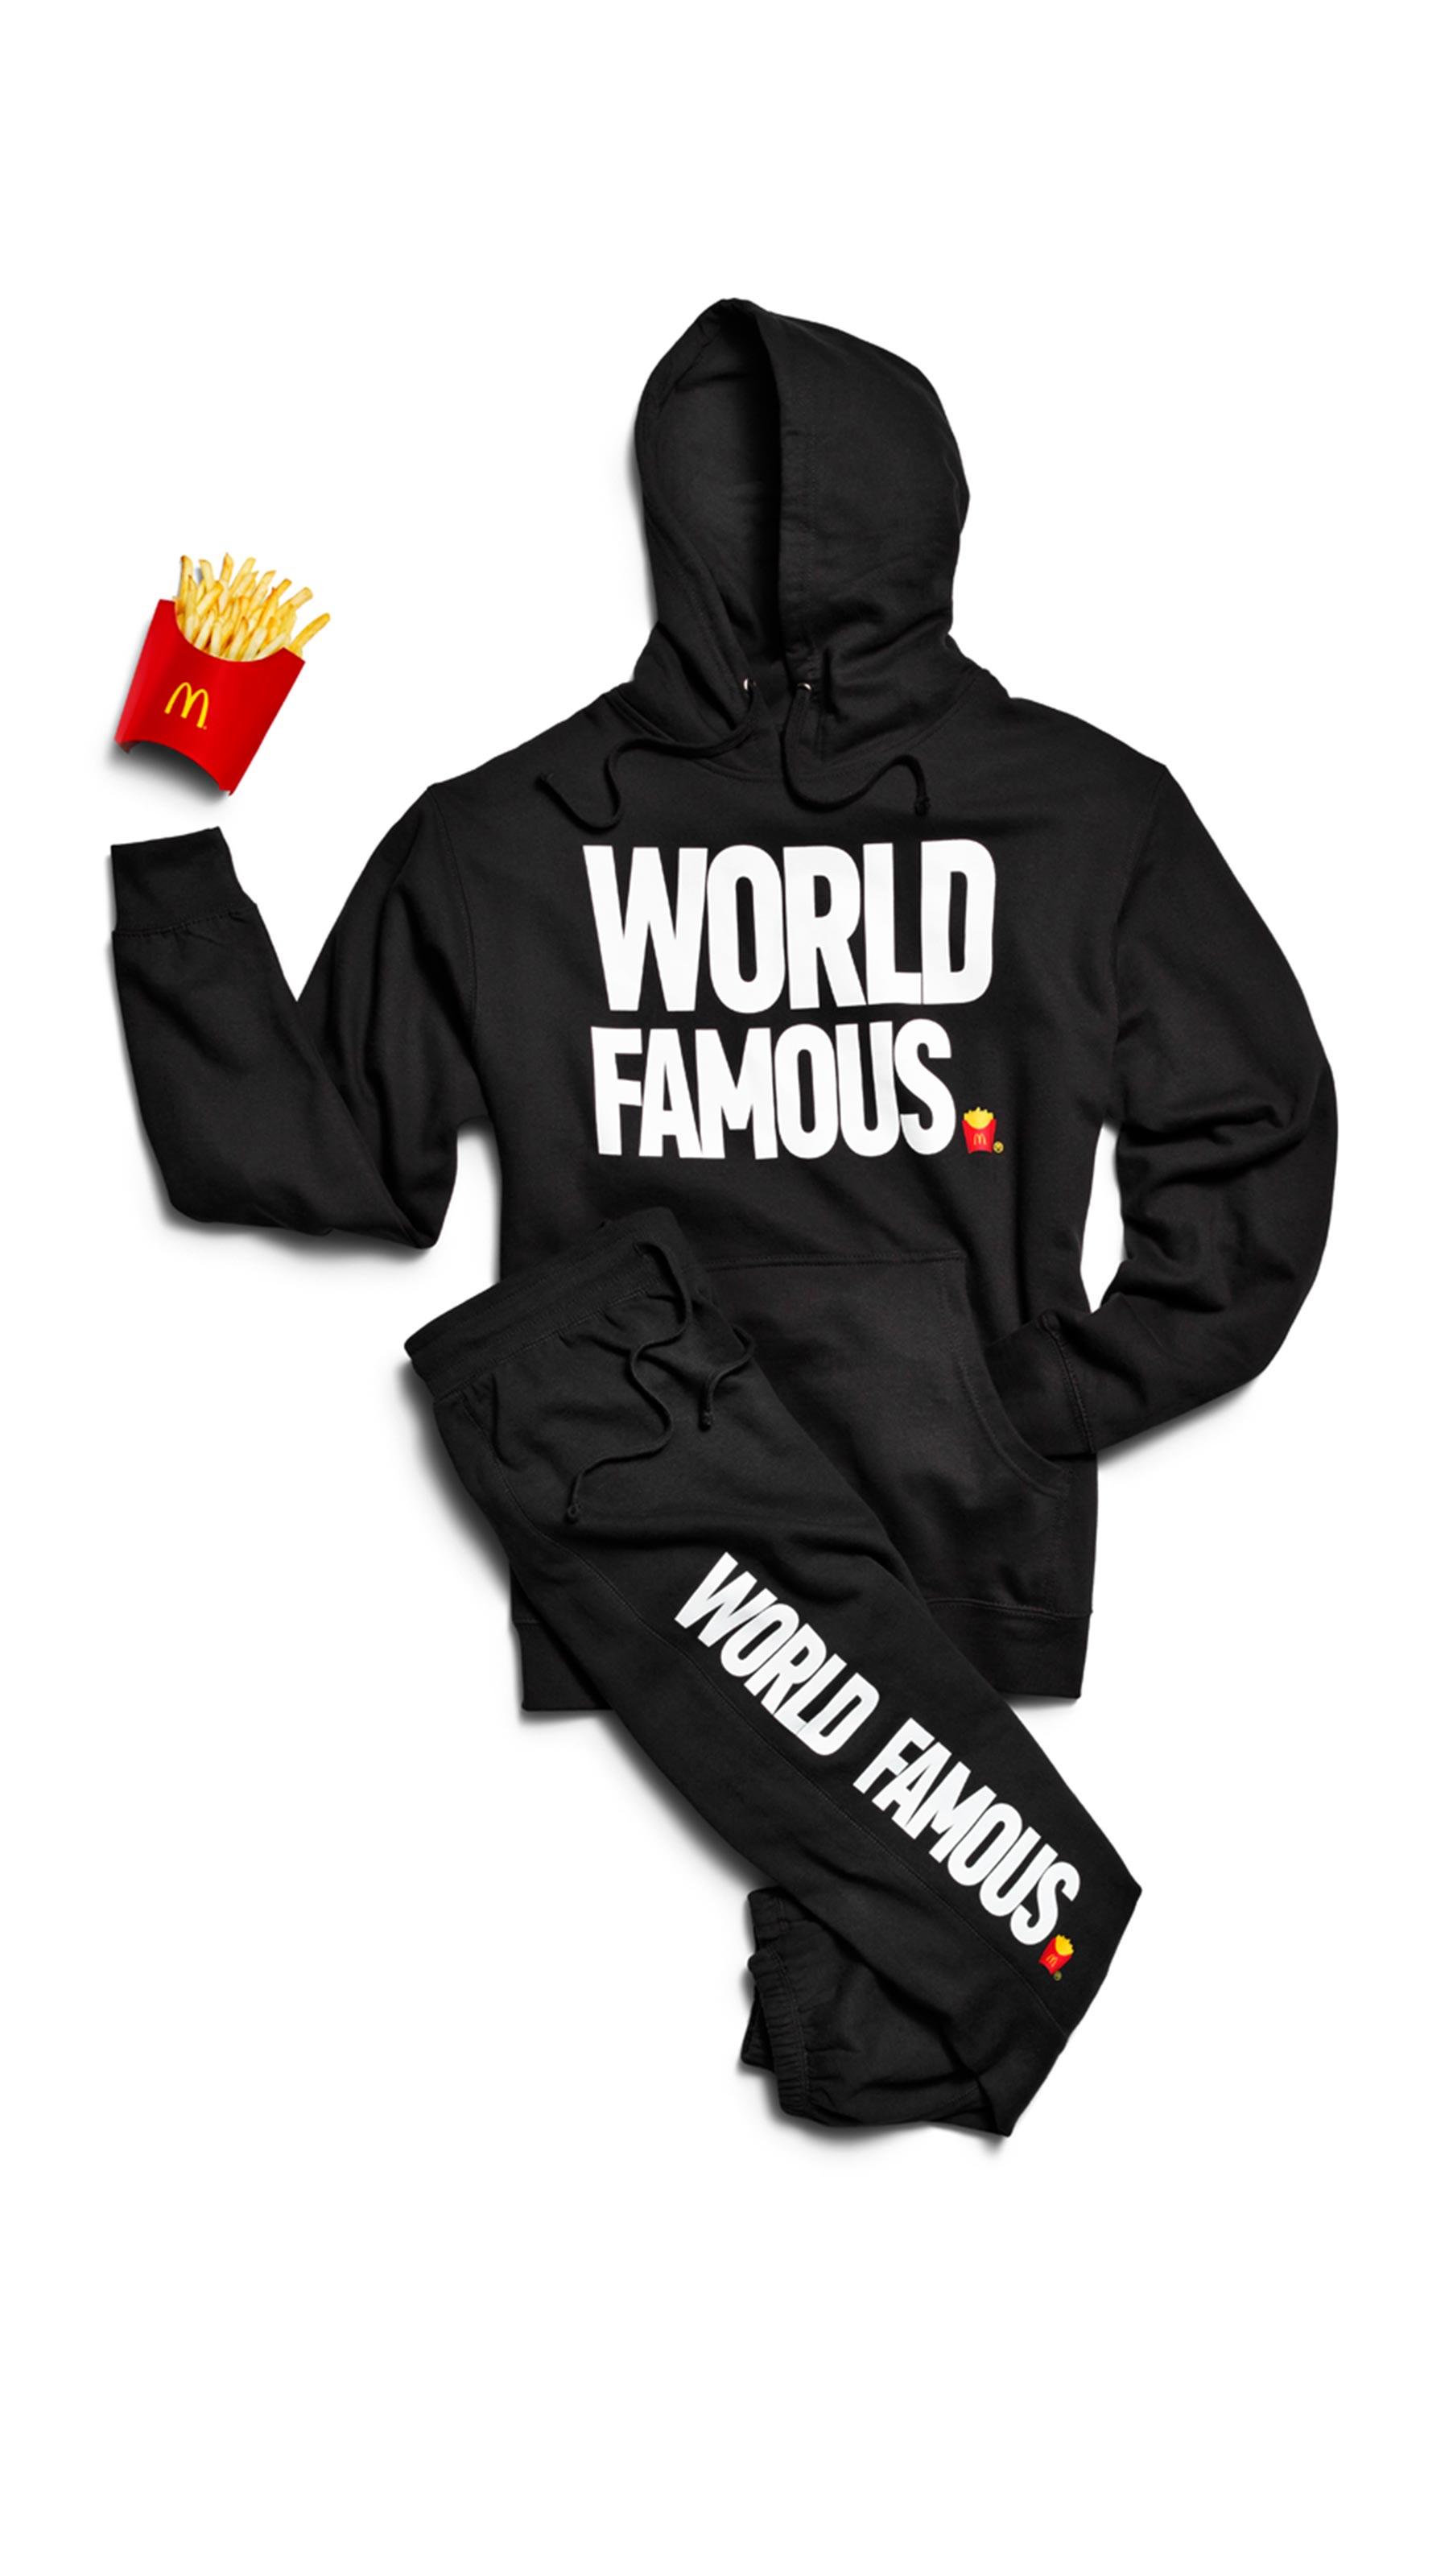 World Famous tracksuit